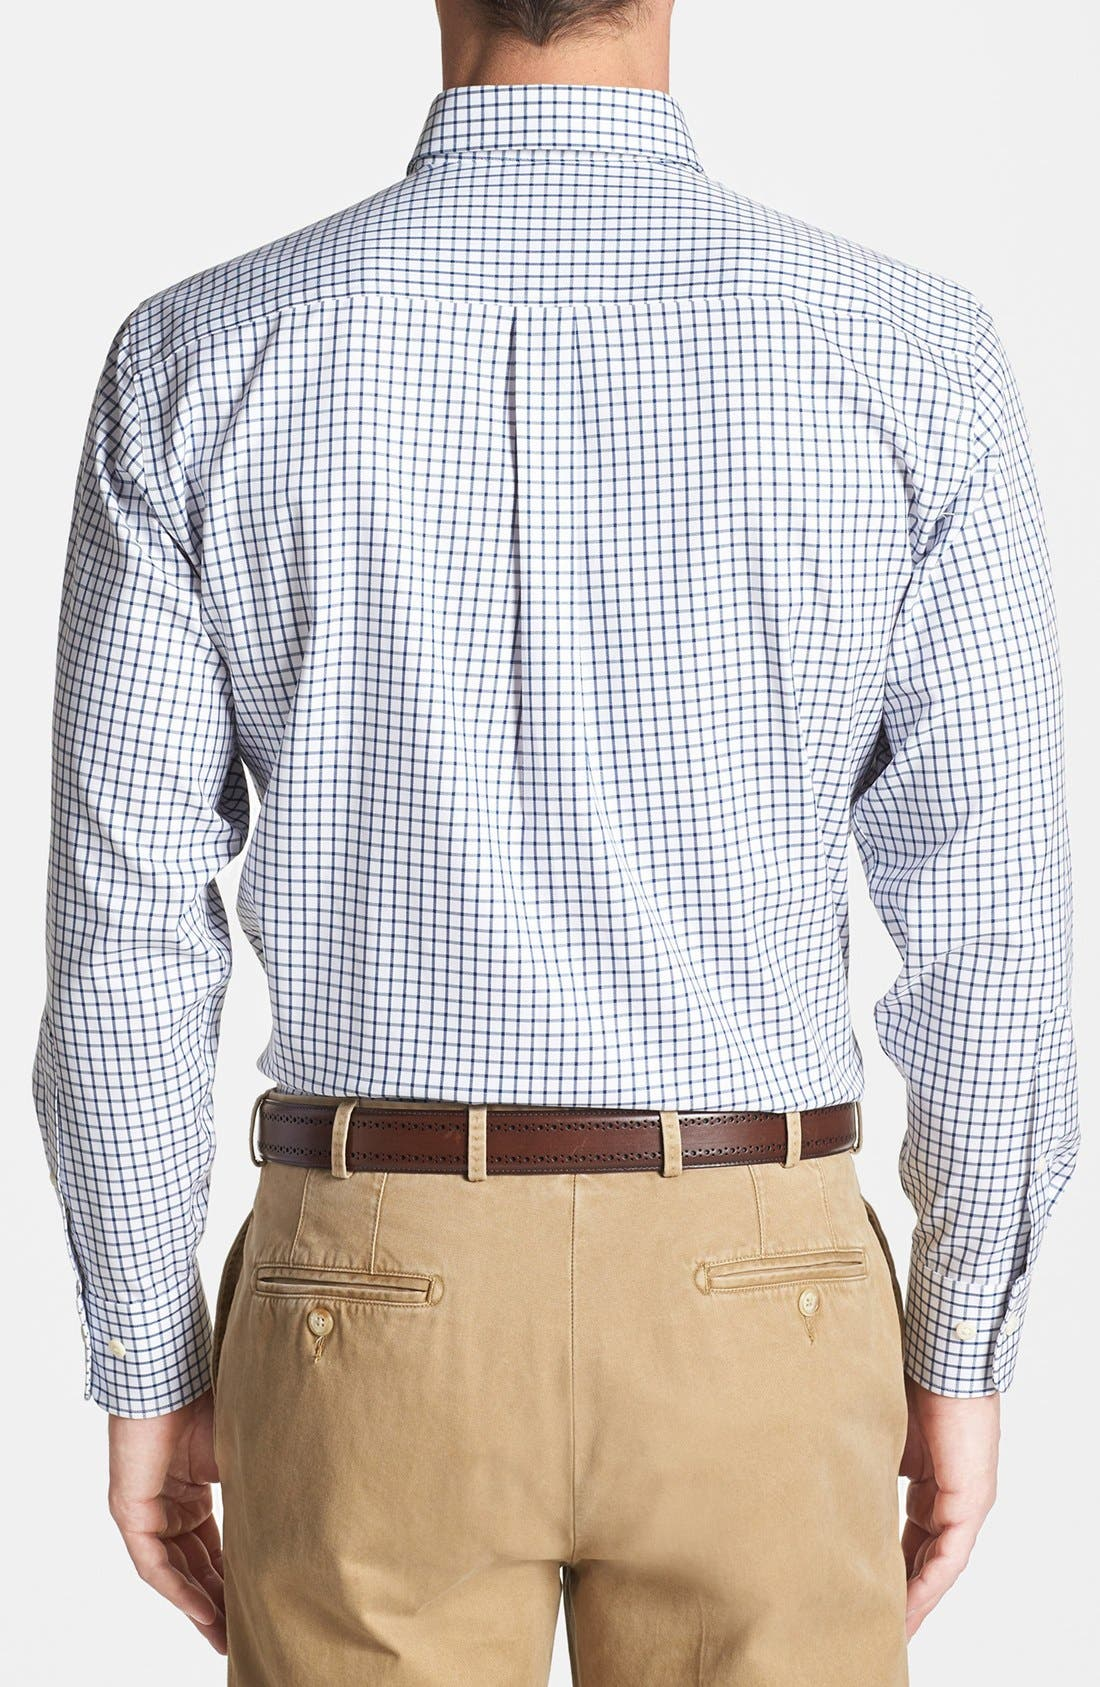 Alternate Image 2  - Peter Millar 'Auburn University' Twill Sport Shirt